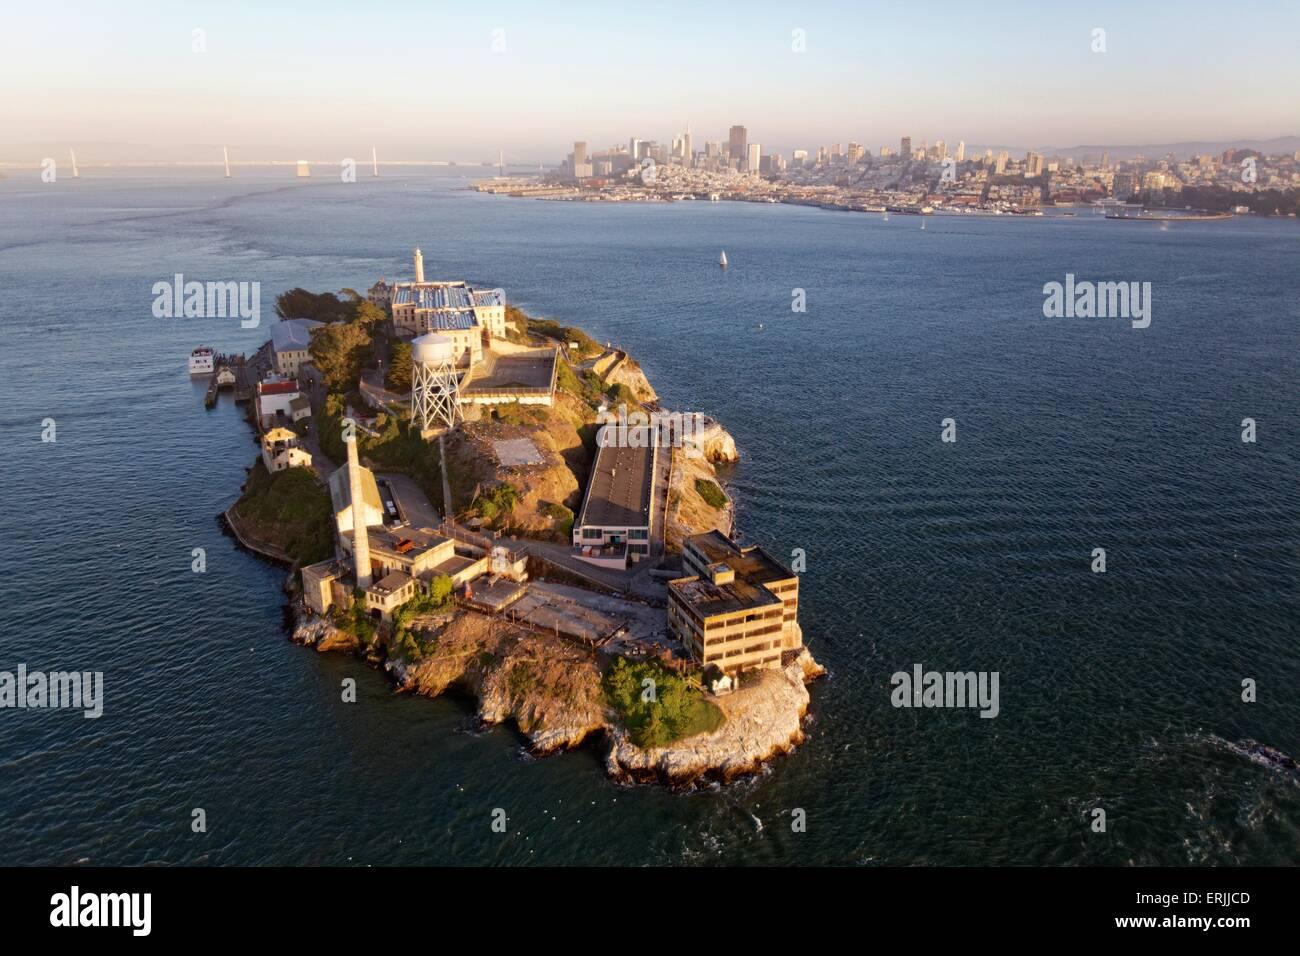 Vista aérea de San Francisco al atardecer vista aérea a San Francisco y la Isla de Alcatraz al atardecer Foto de stock